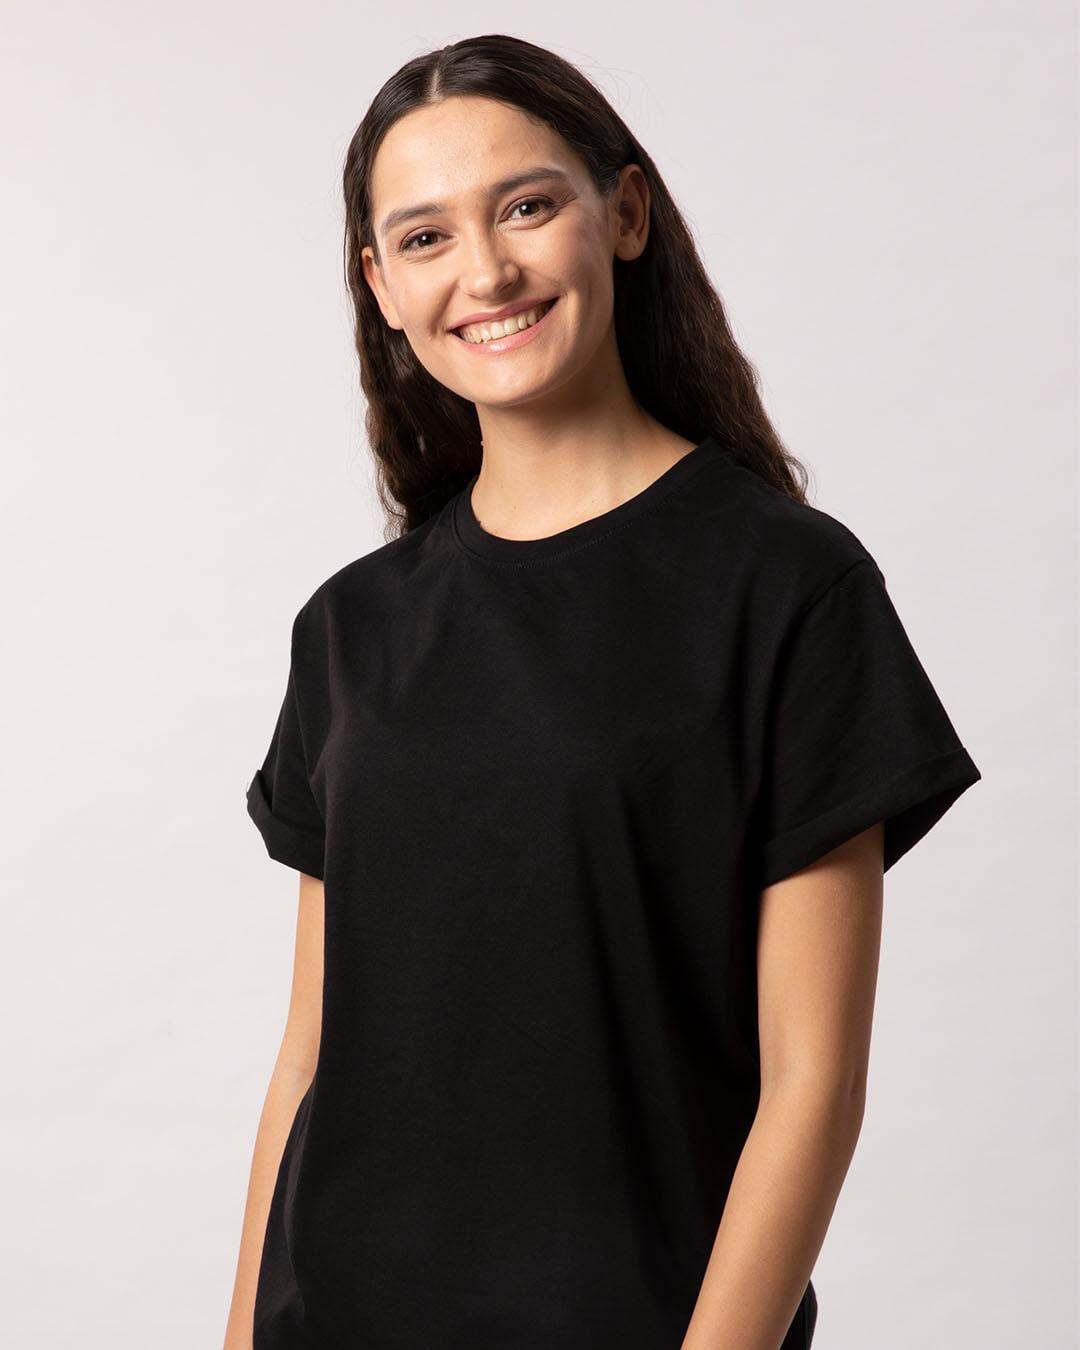 0dc2628362d7 Buy Black Boyfriend T-Shirt Women's Boyfriend T-shirt Online India -  Bewakoof.com